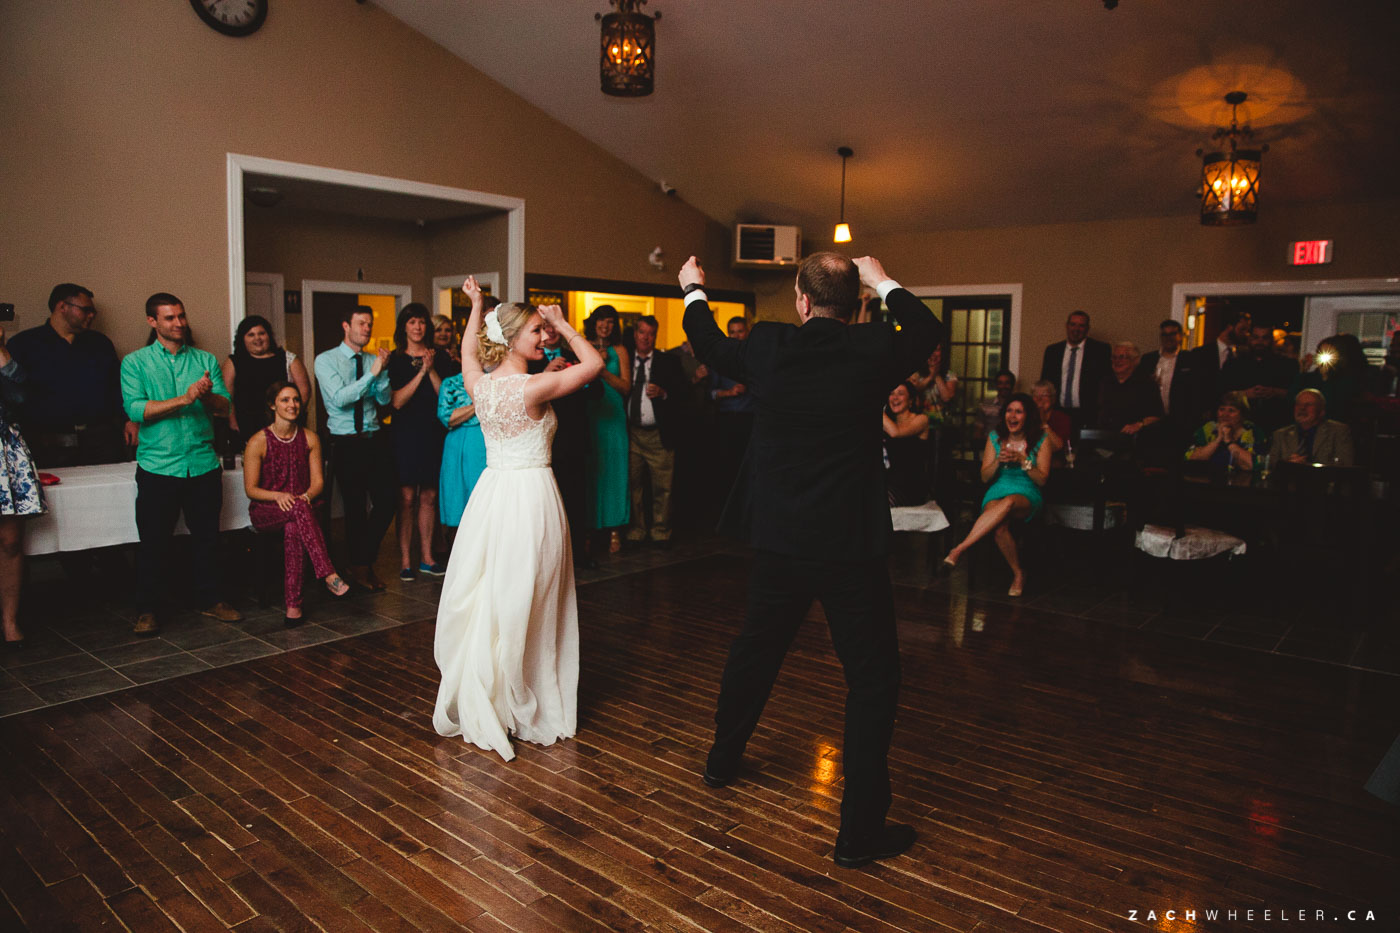 Sarah-Grant-Lesters-Fram-Wedding-102